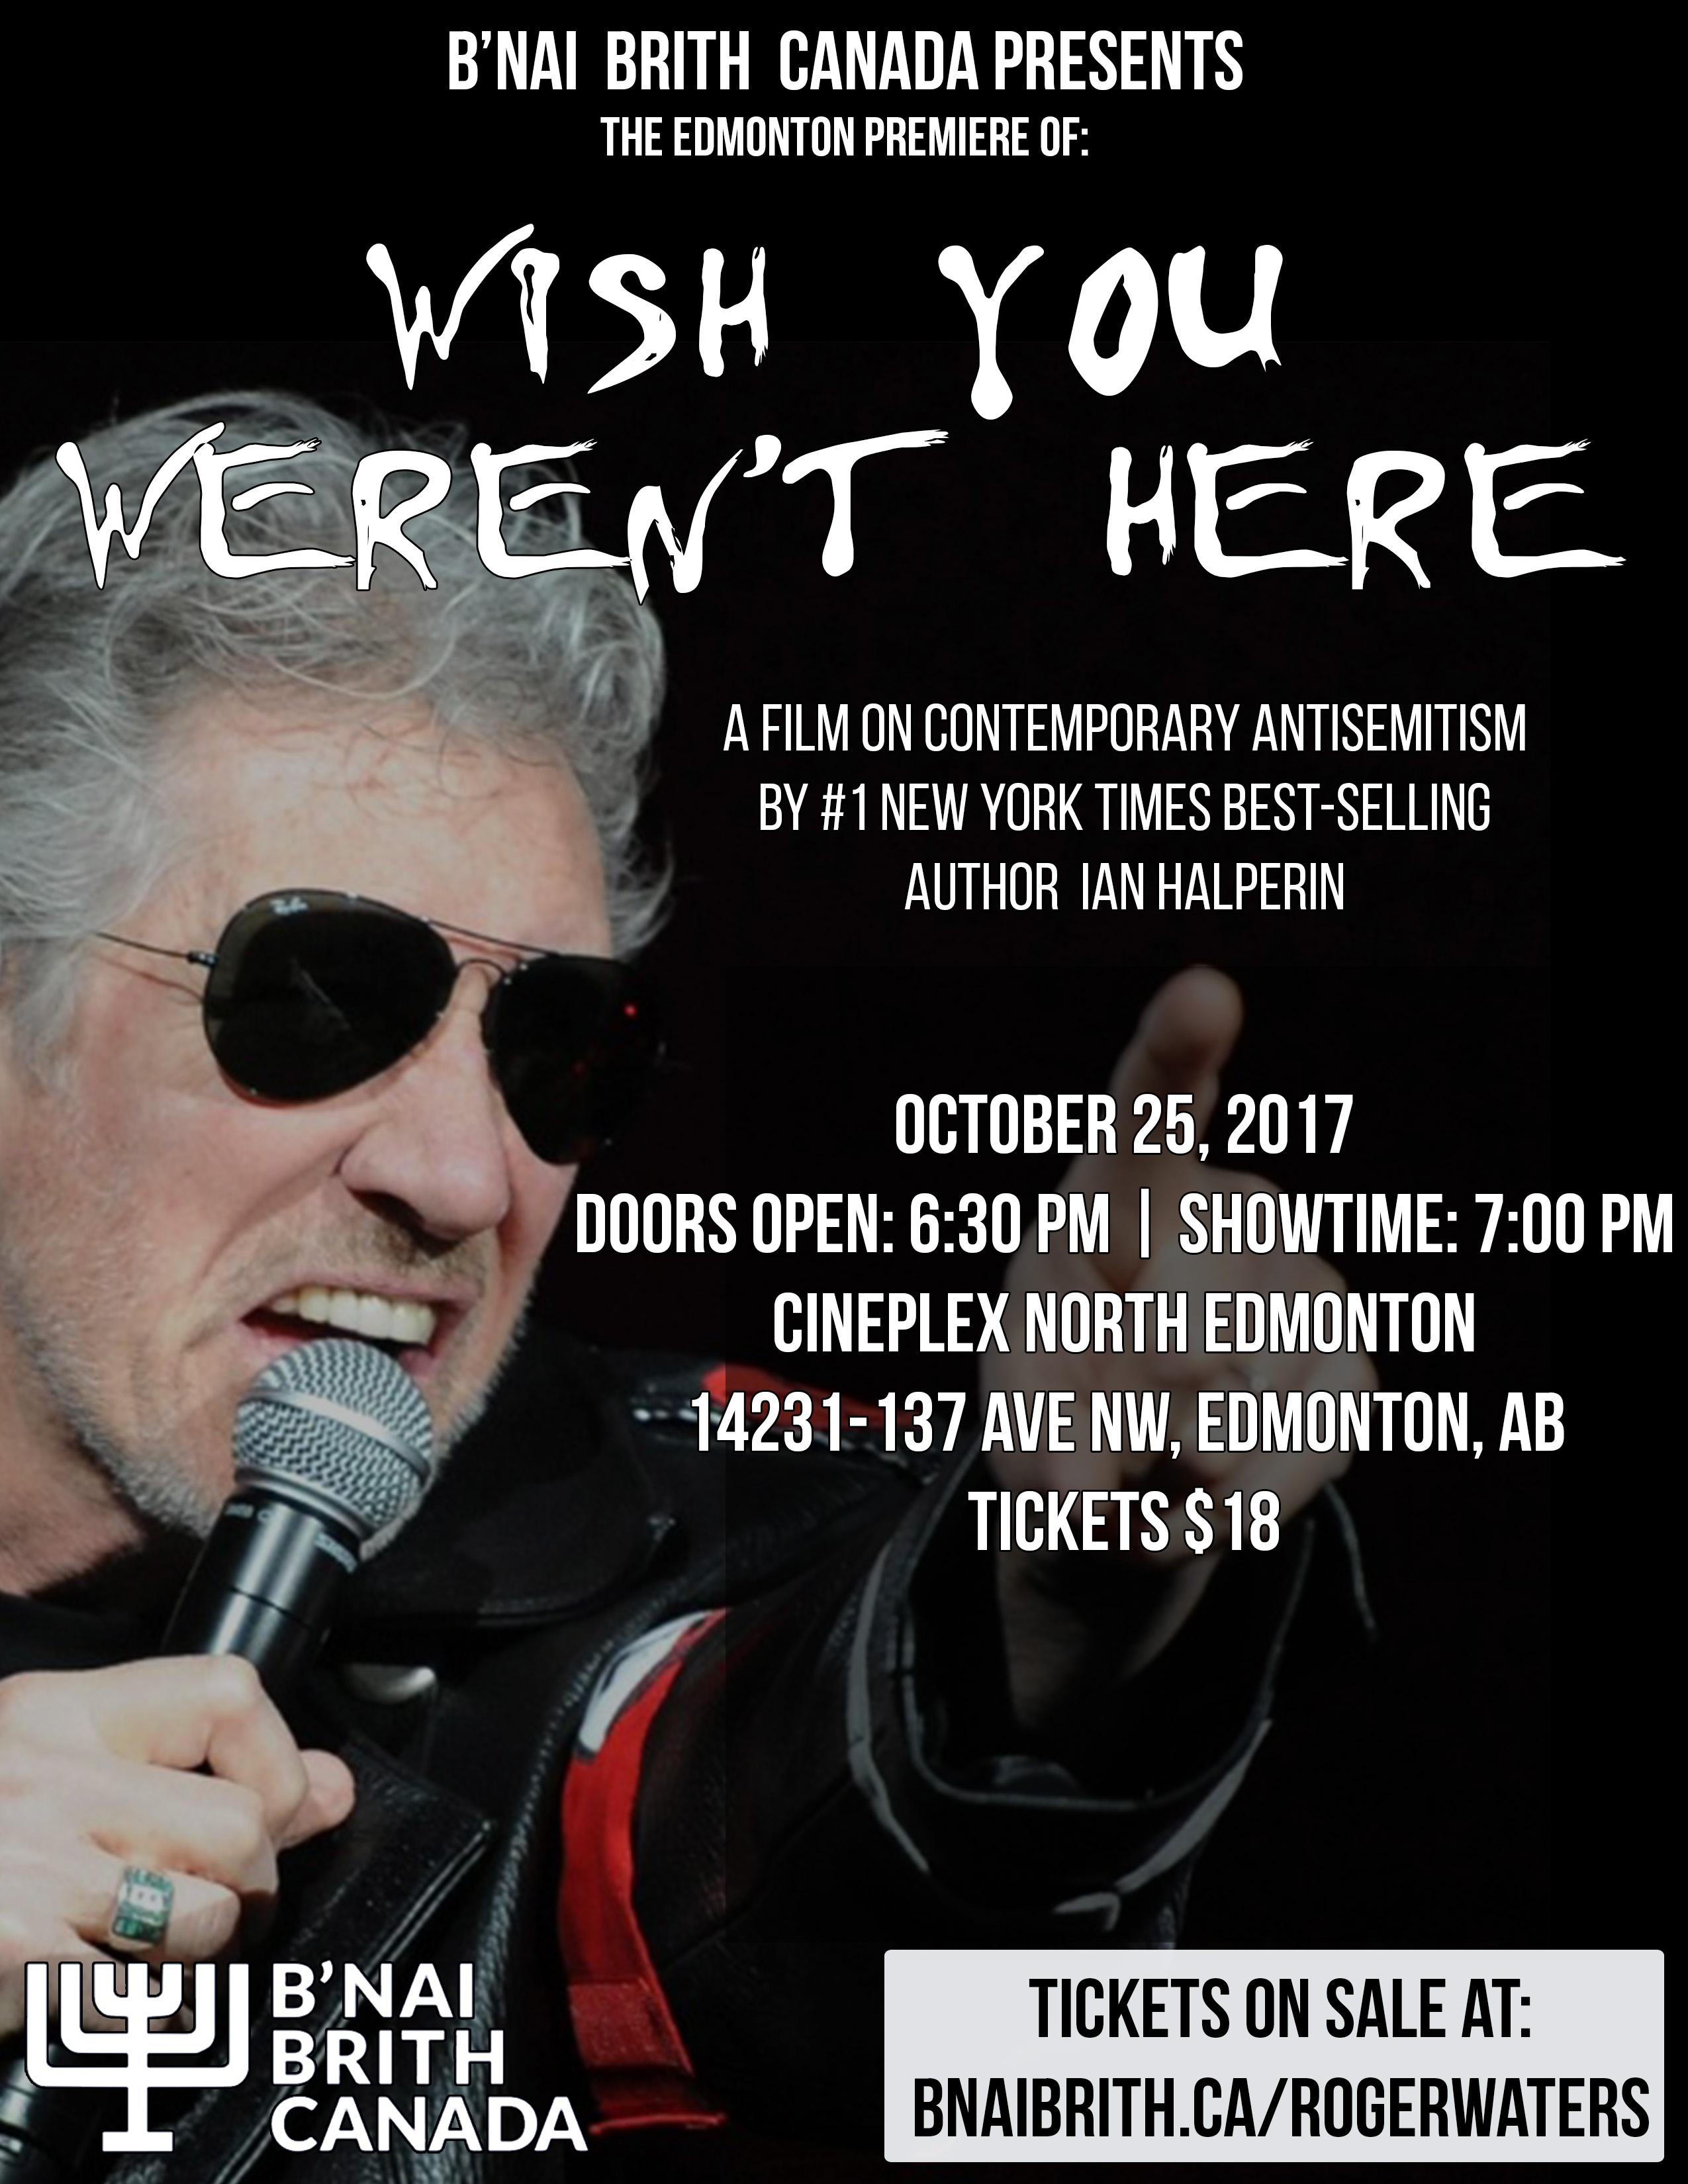 Wish_You_Were_not_Here_Poster_EDMONTON.jpg